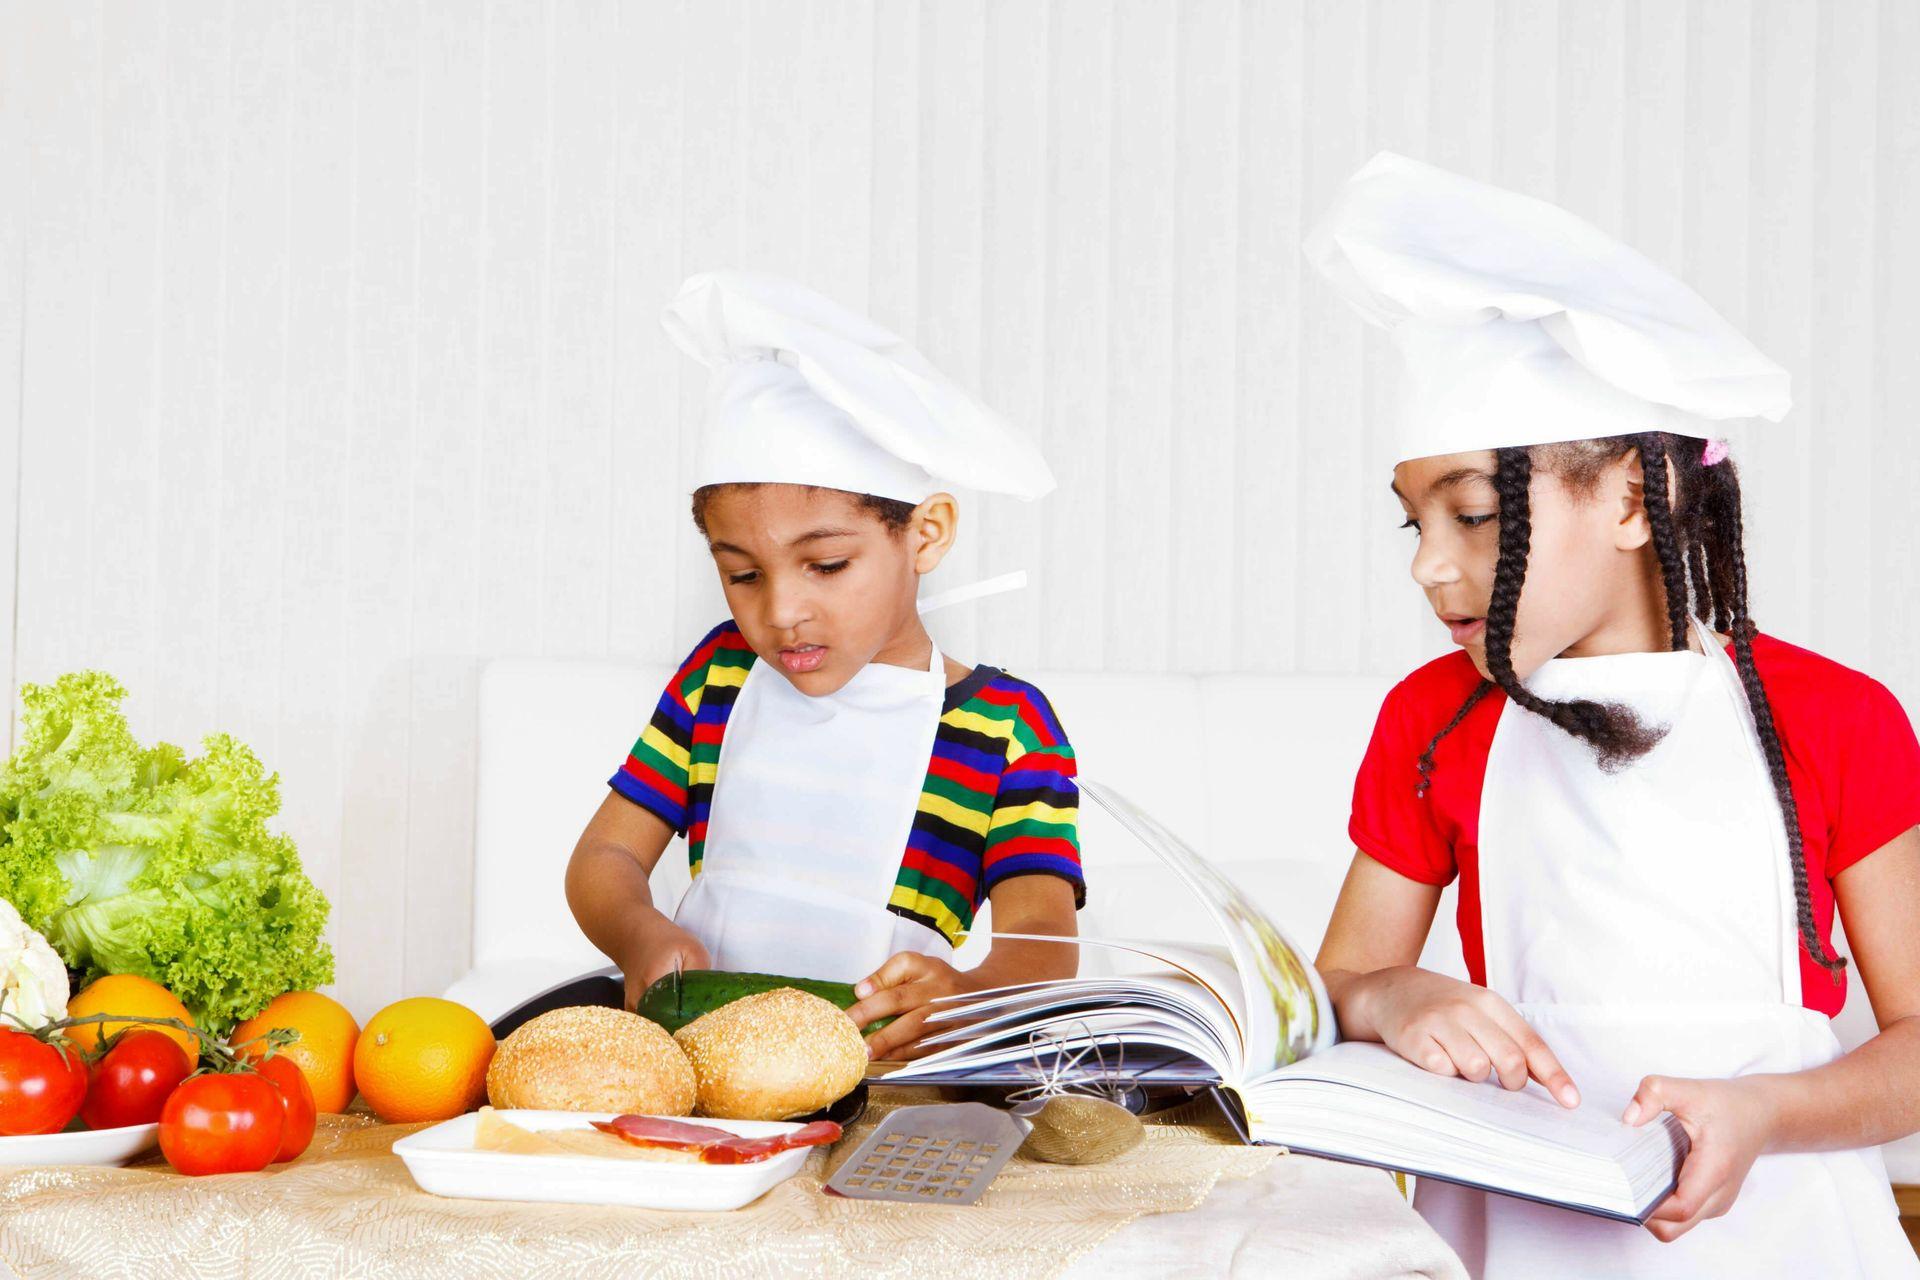 adobestock_32379074-cooking